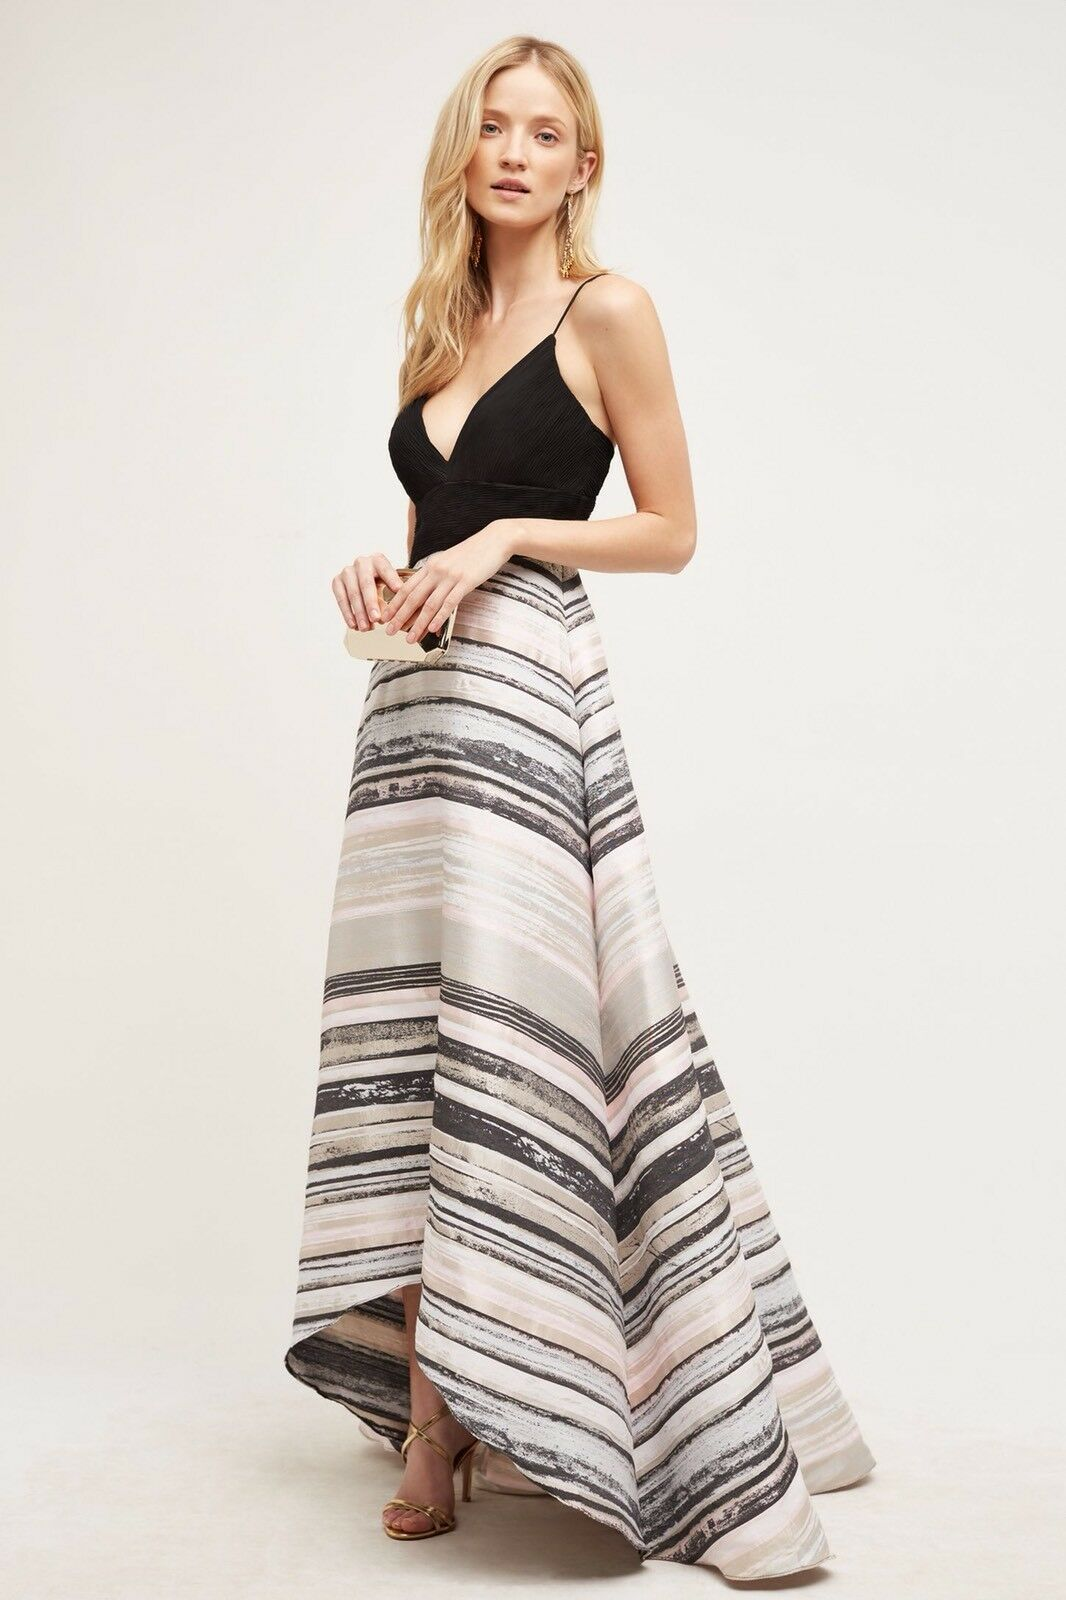 NWoT Anthropoligie Womens Miramare Gown By BaDgley Mischka Size 4 Sold Out